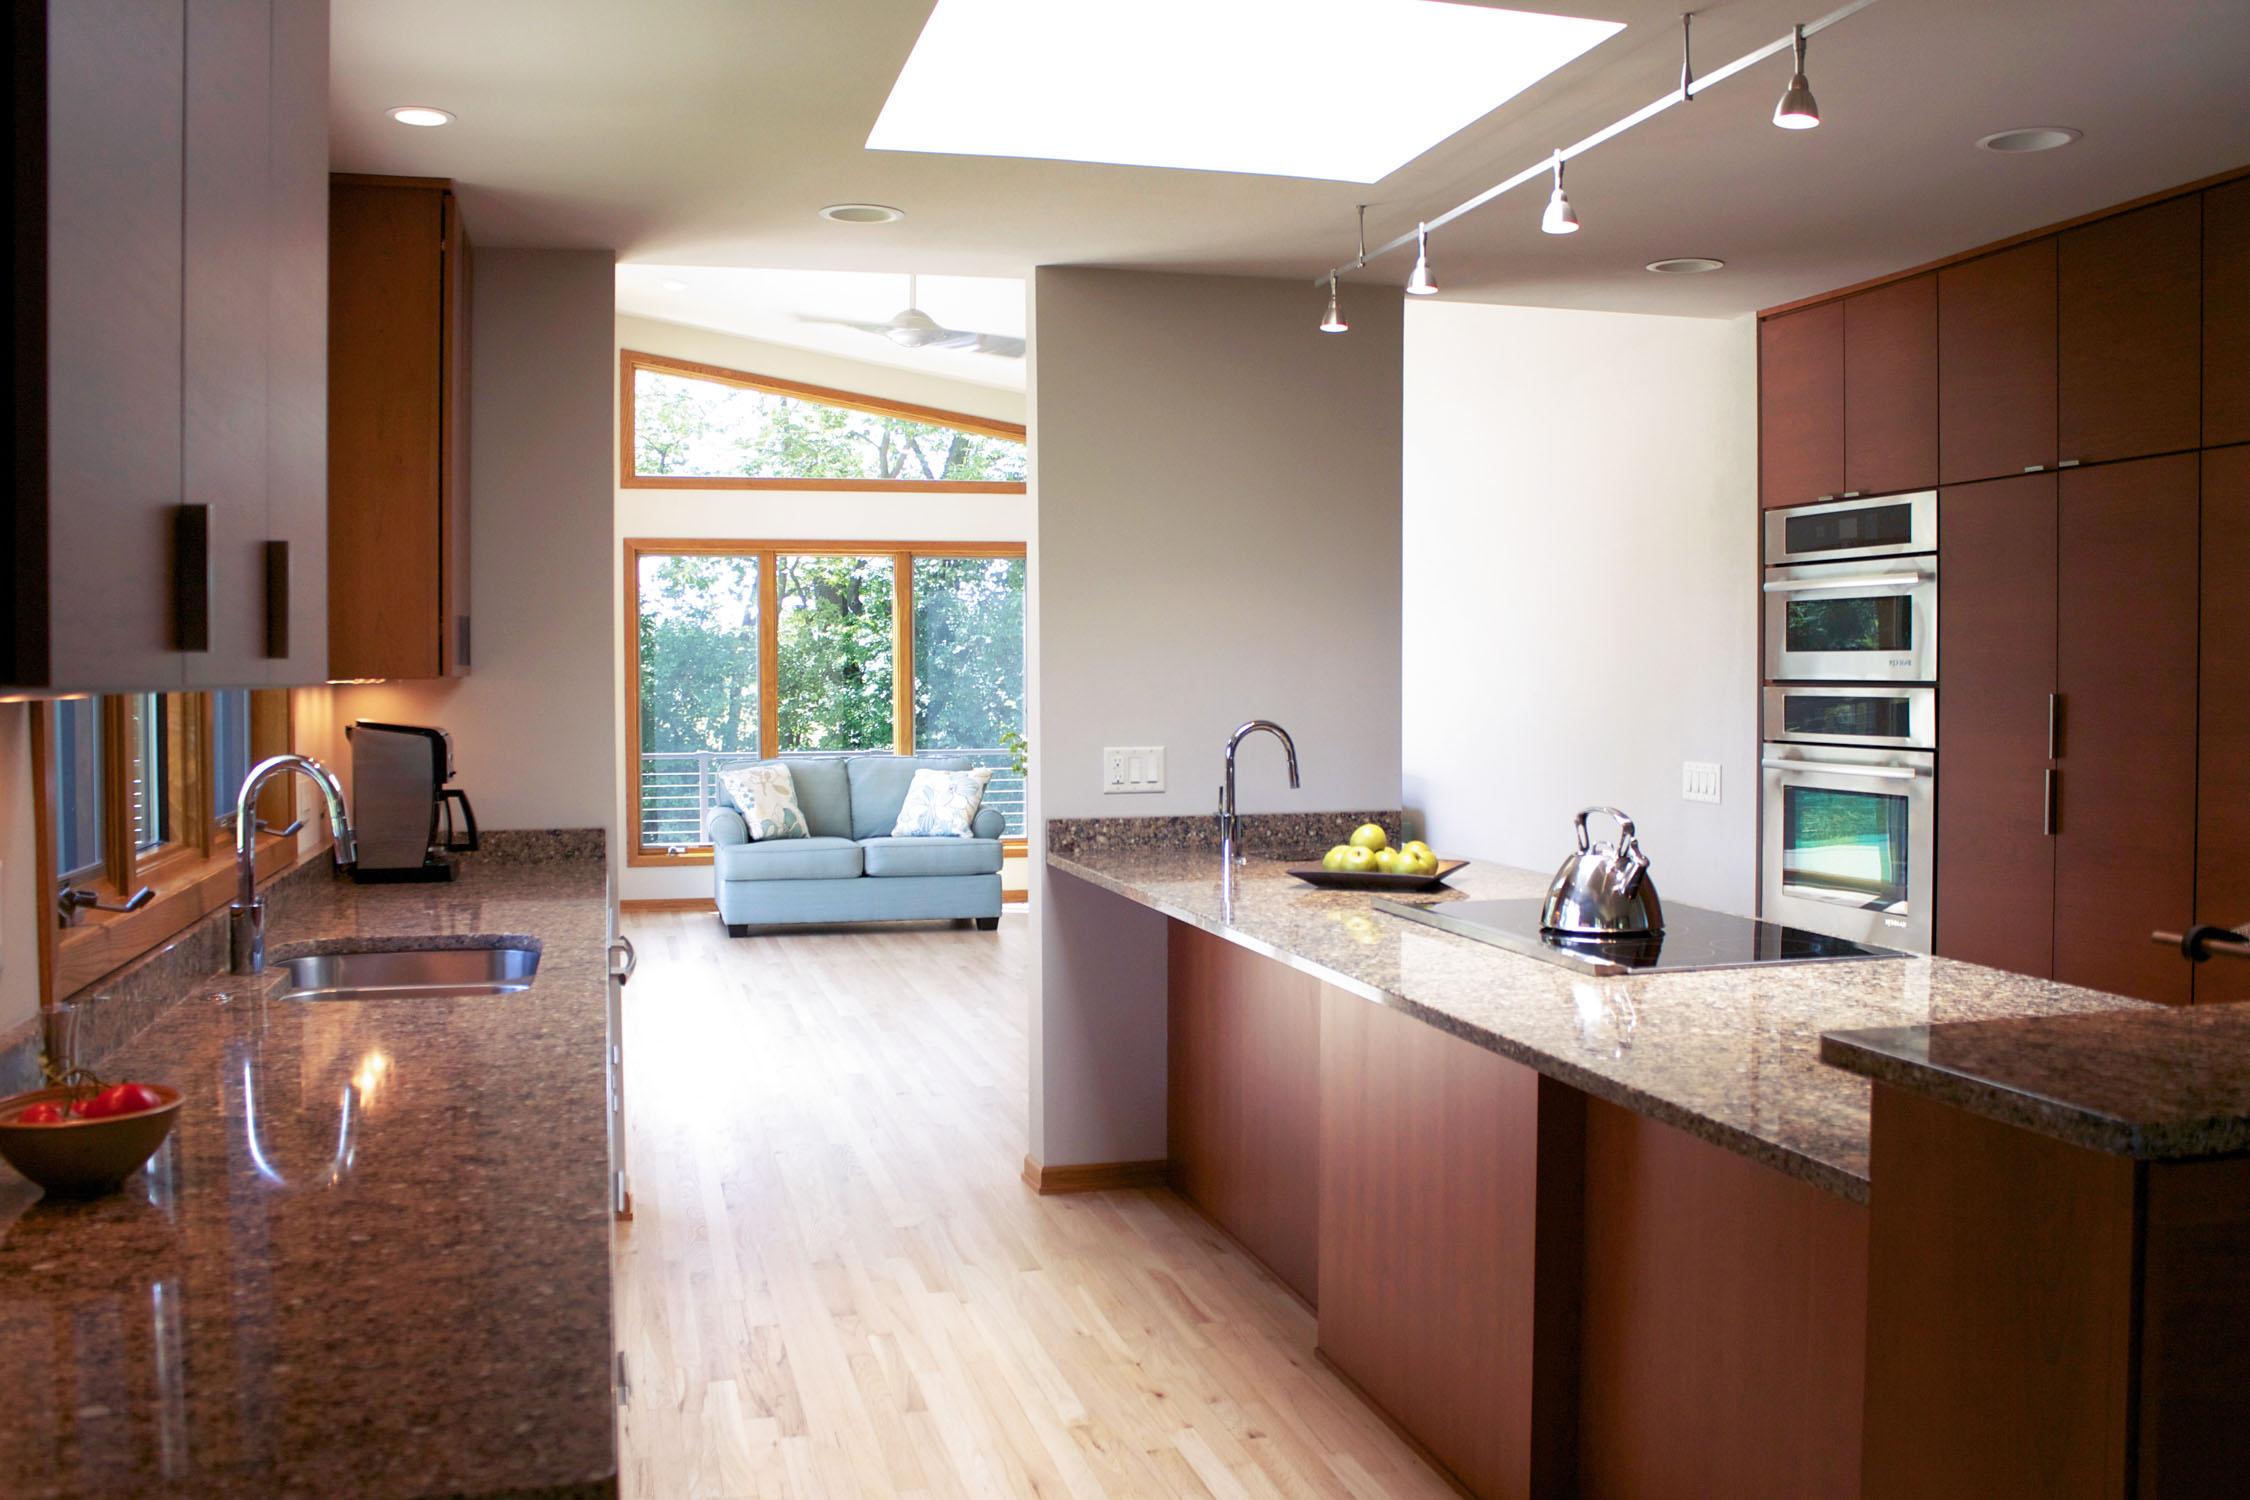 1970's Asymetrically Balanced Home